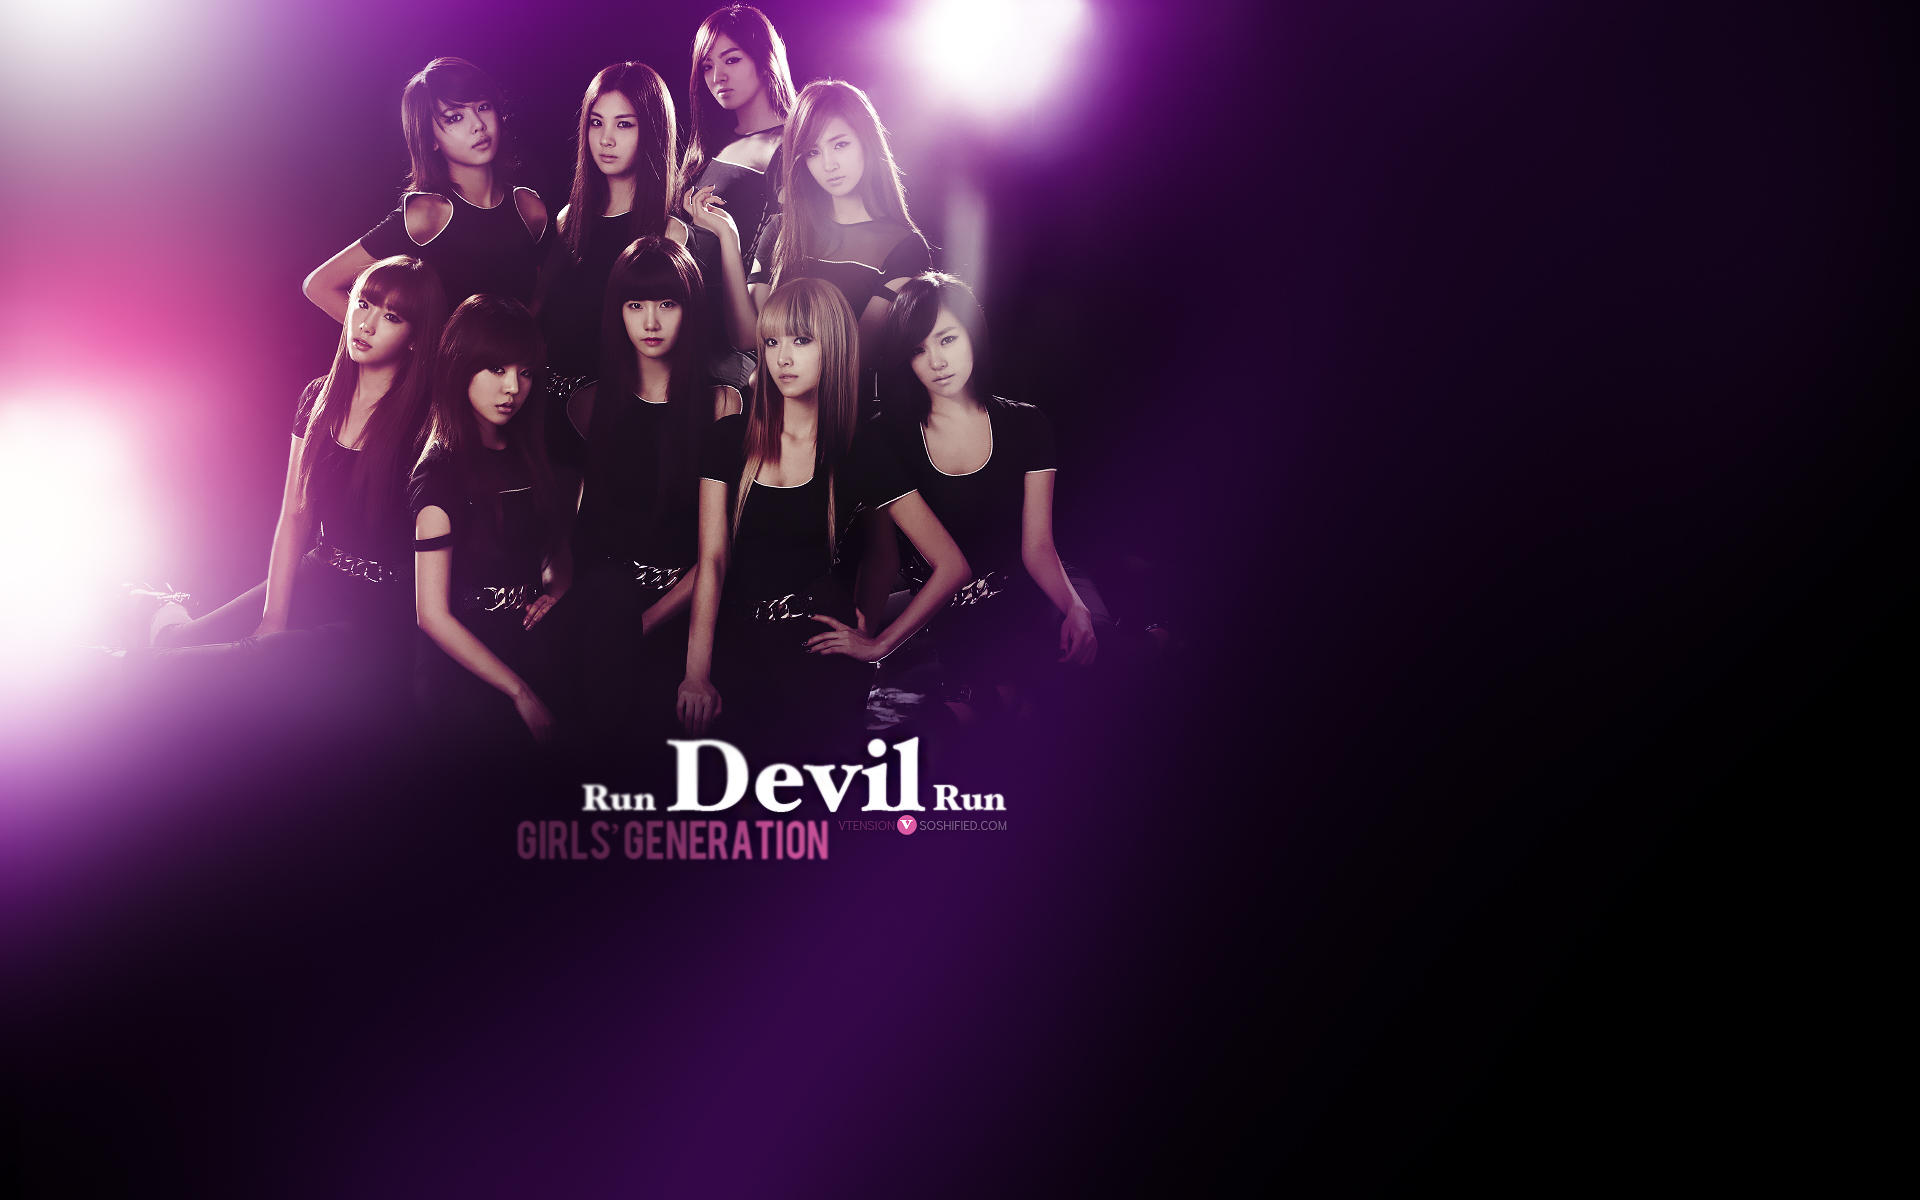 Run Devil Run Wallpaper 03 by xyunaxfantasiesx